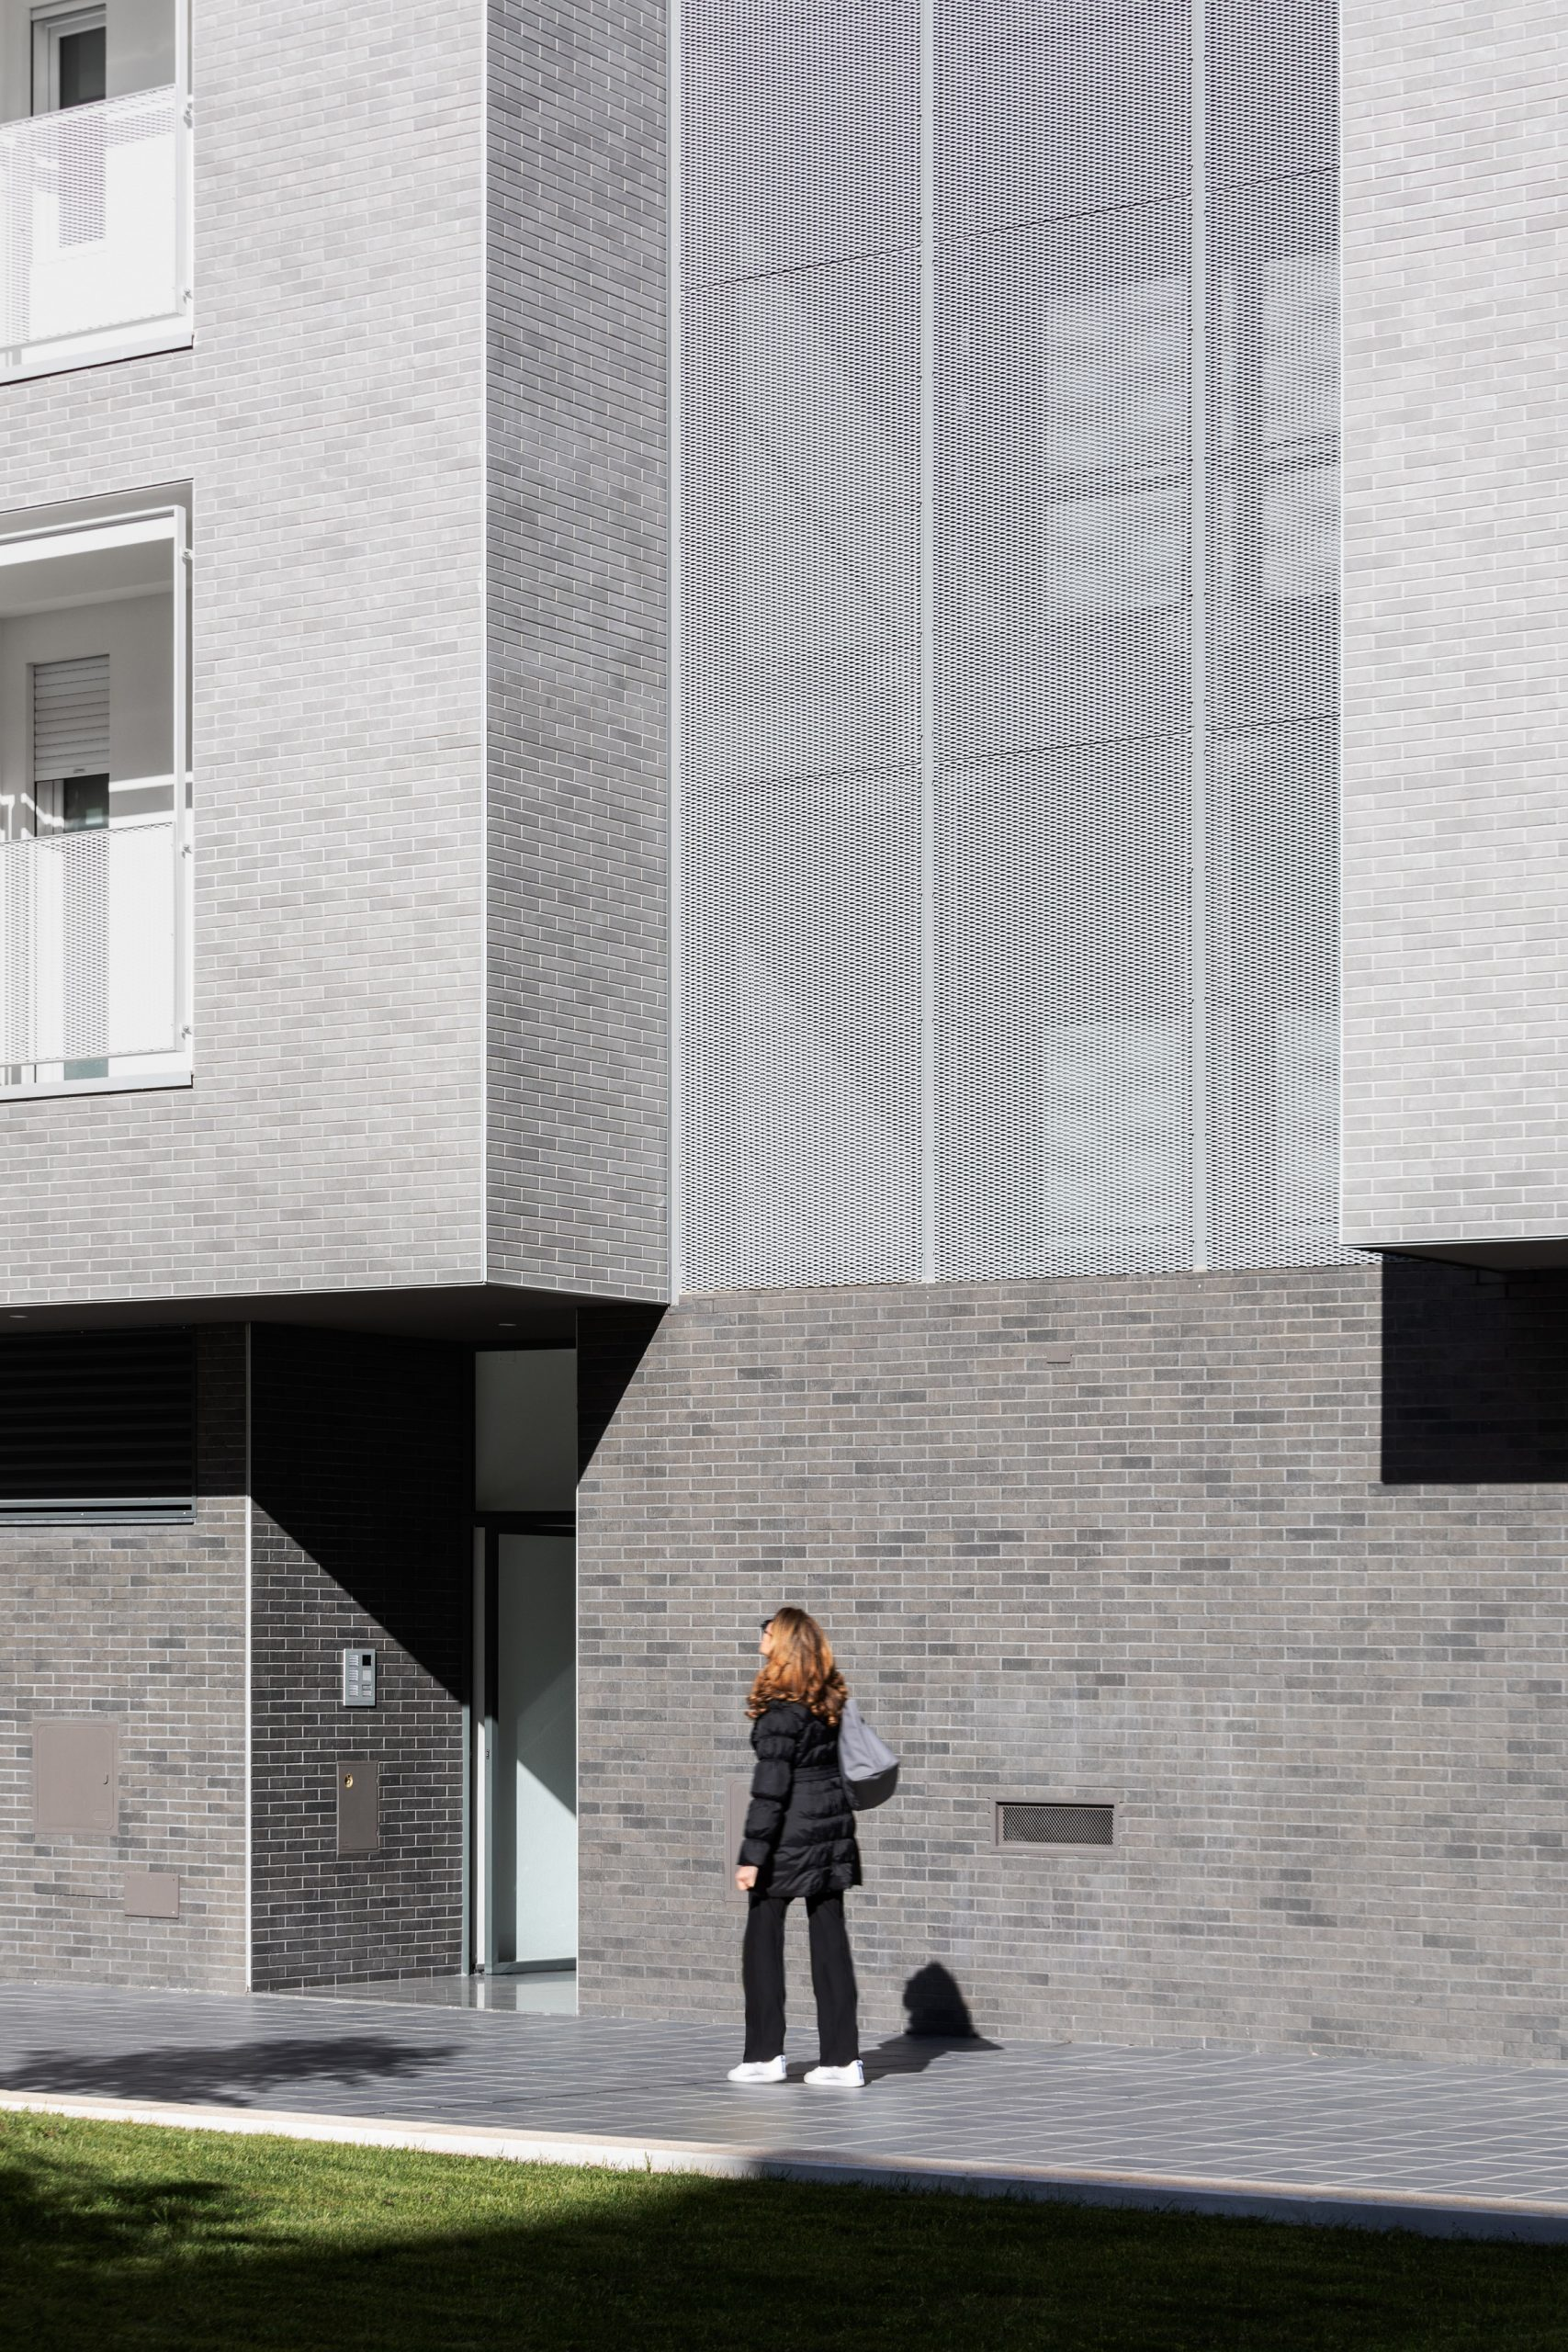 Metal sheets complements the grey brickwork